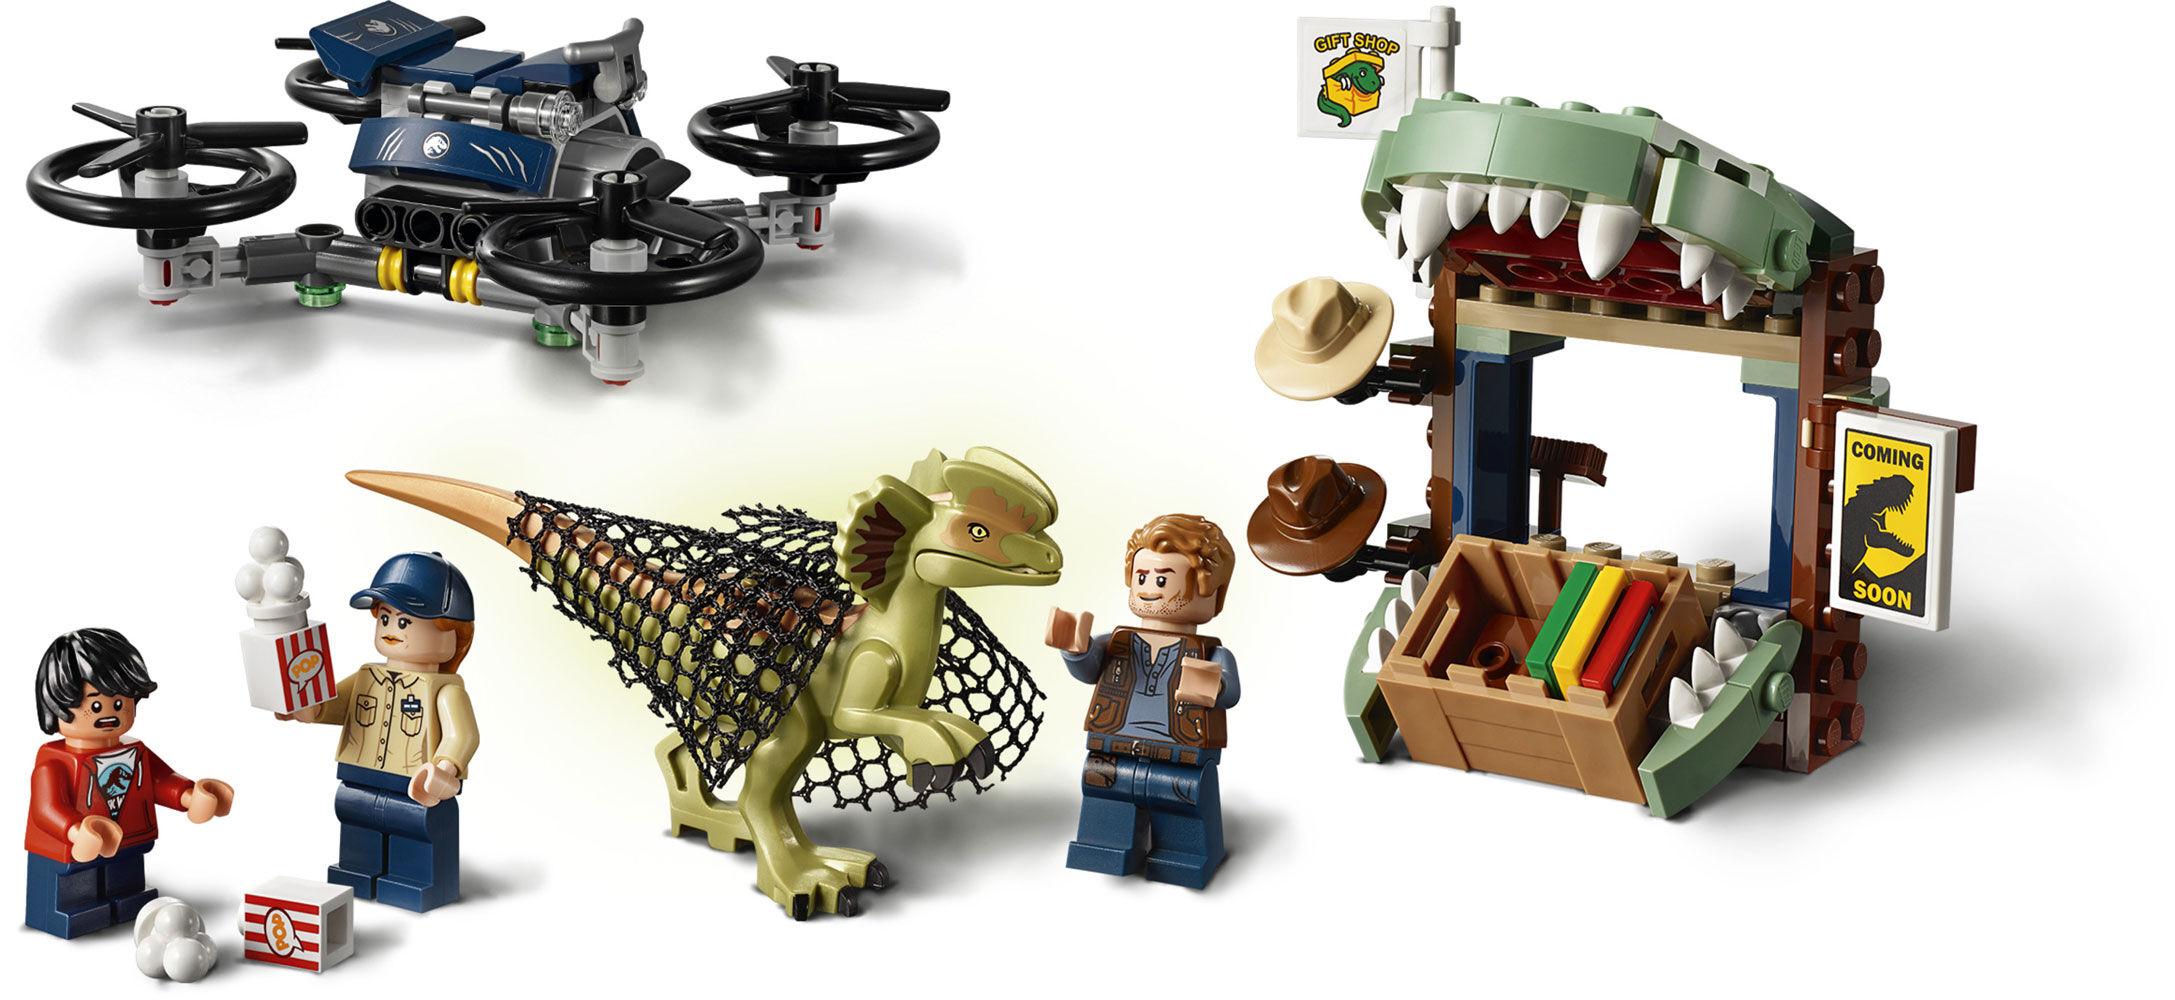 Dilophosaurus on the Loose LEGO Jurassic World 75934